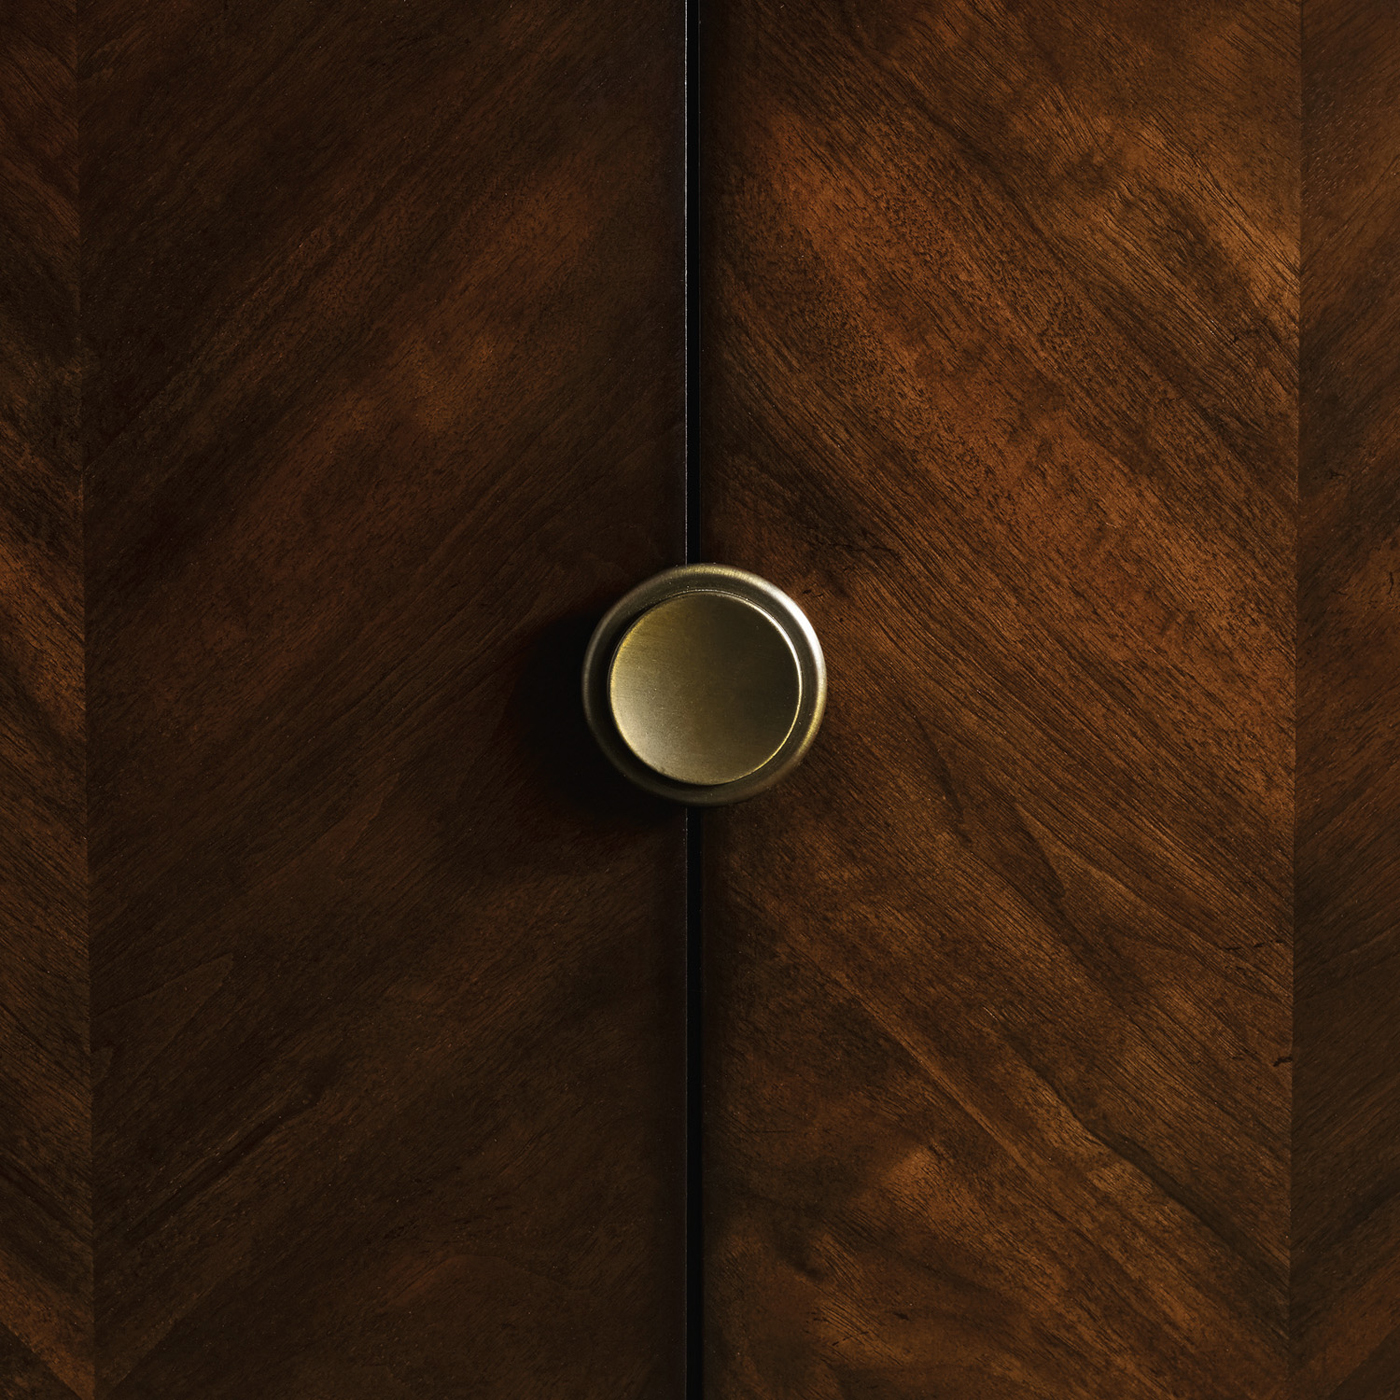 paxton 68 inch hall chest bathroom vanitycole & co. designer